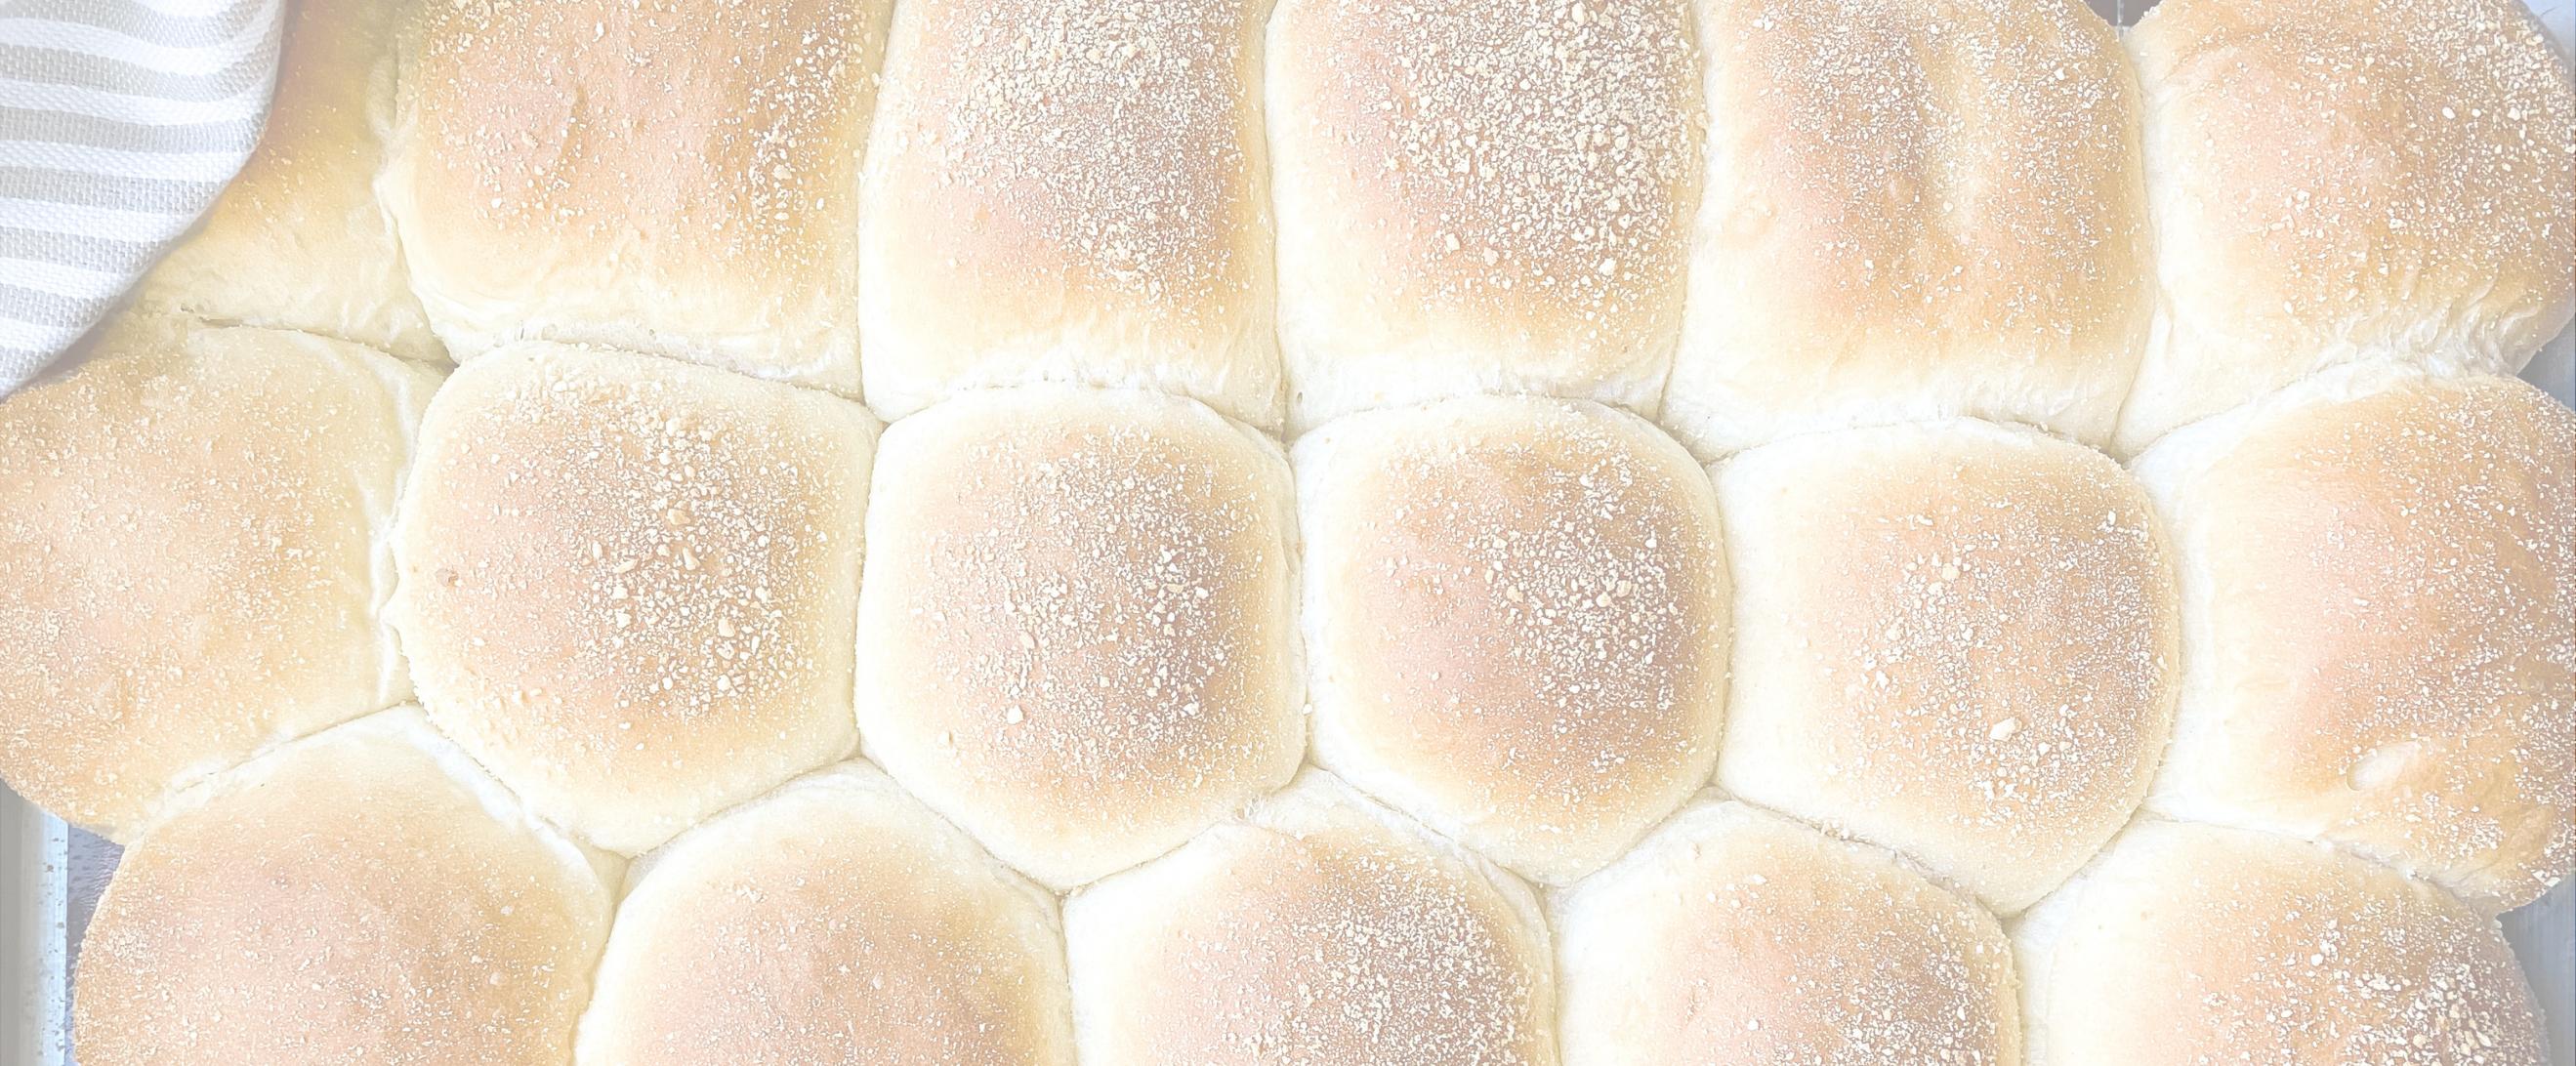 Bread Baking Online Course Butterbuns